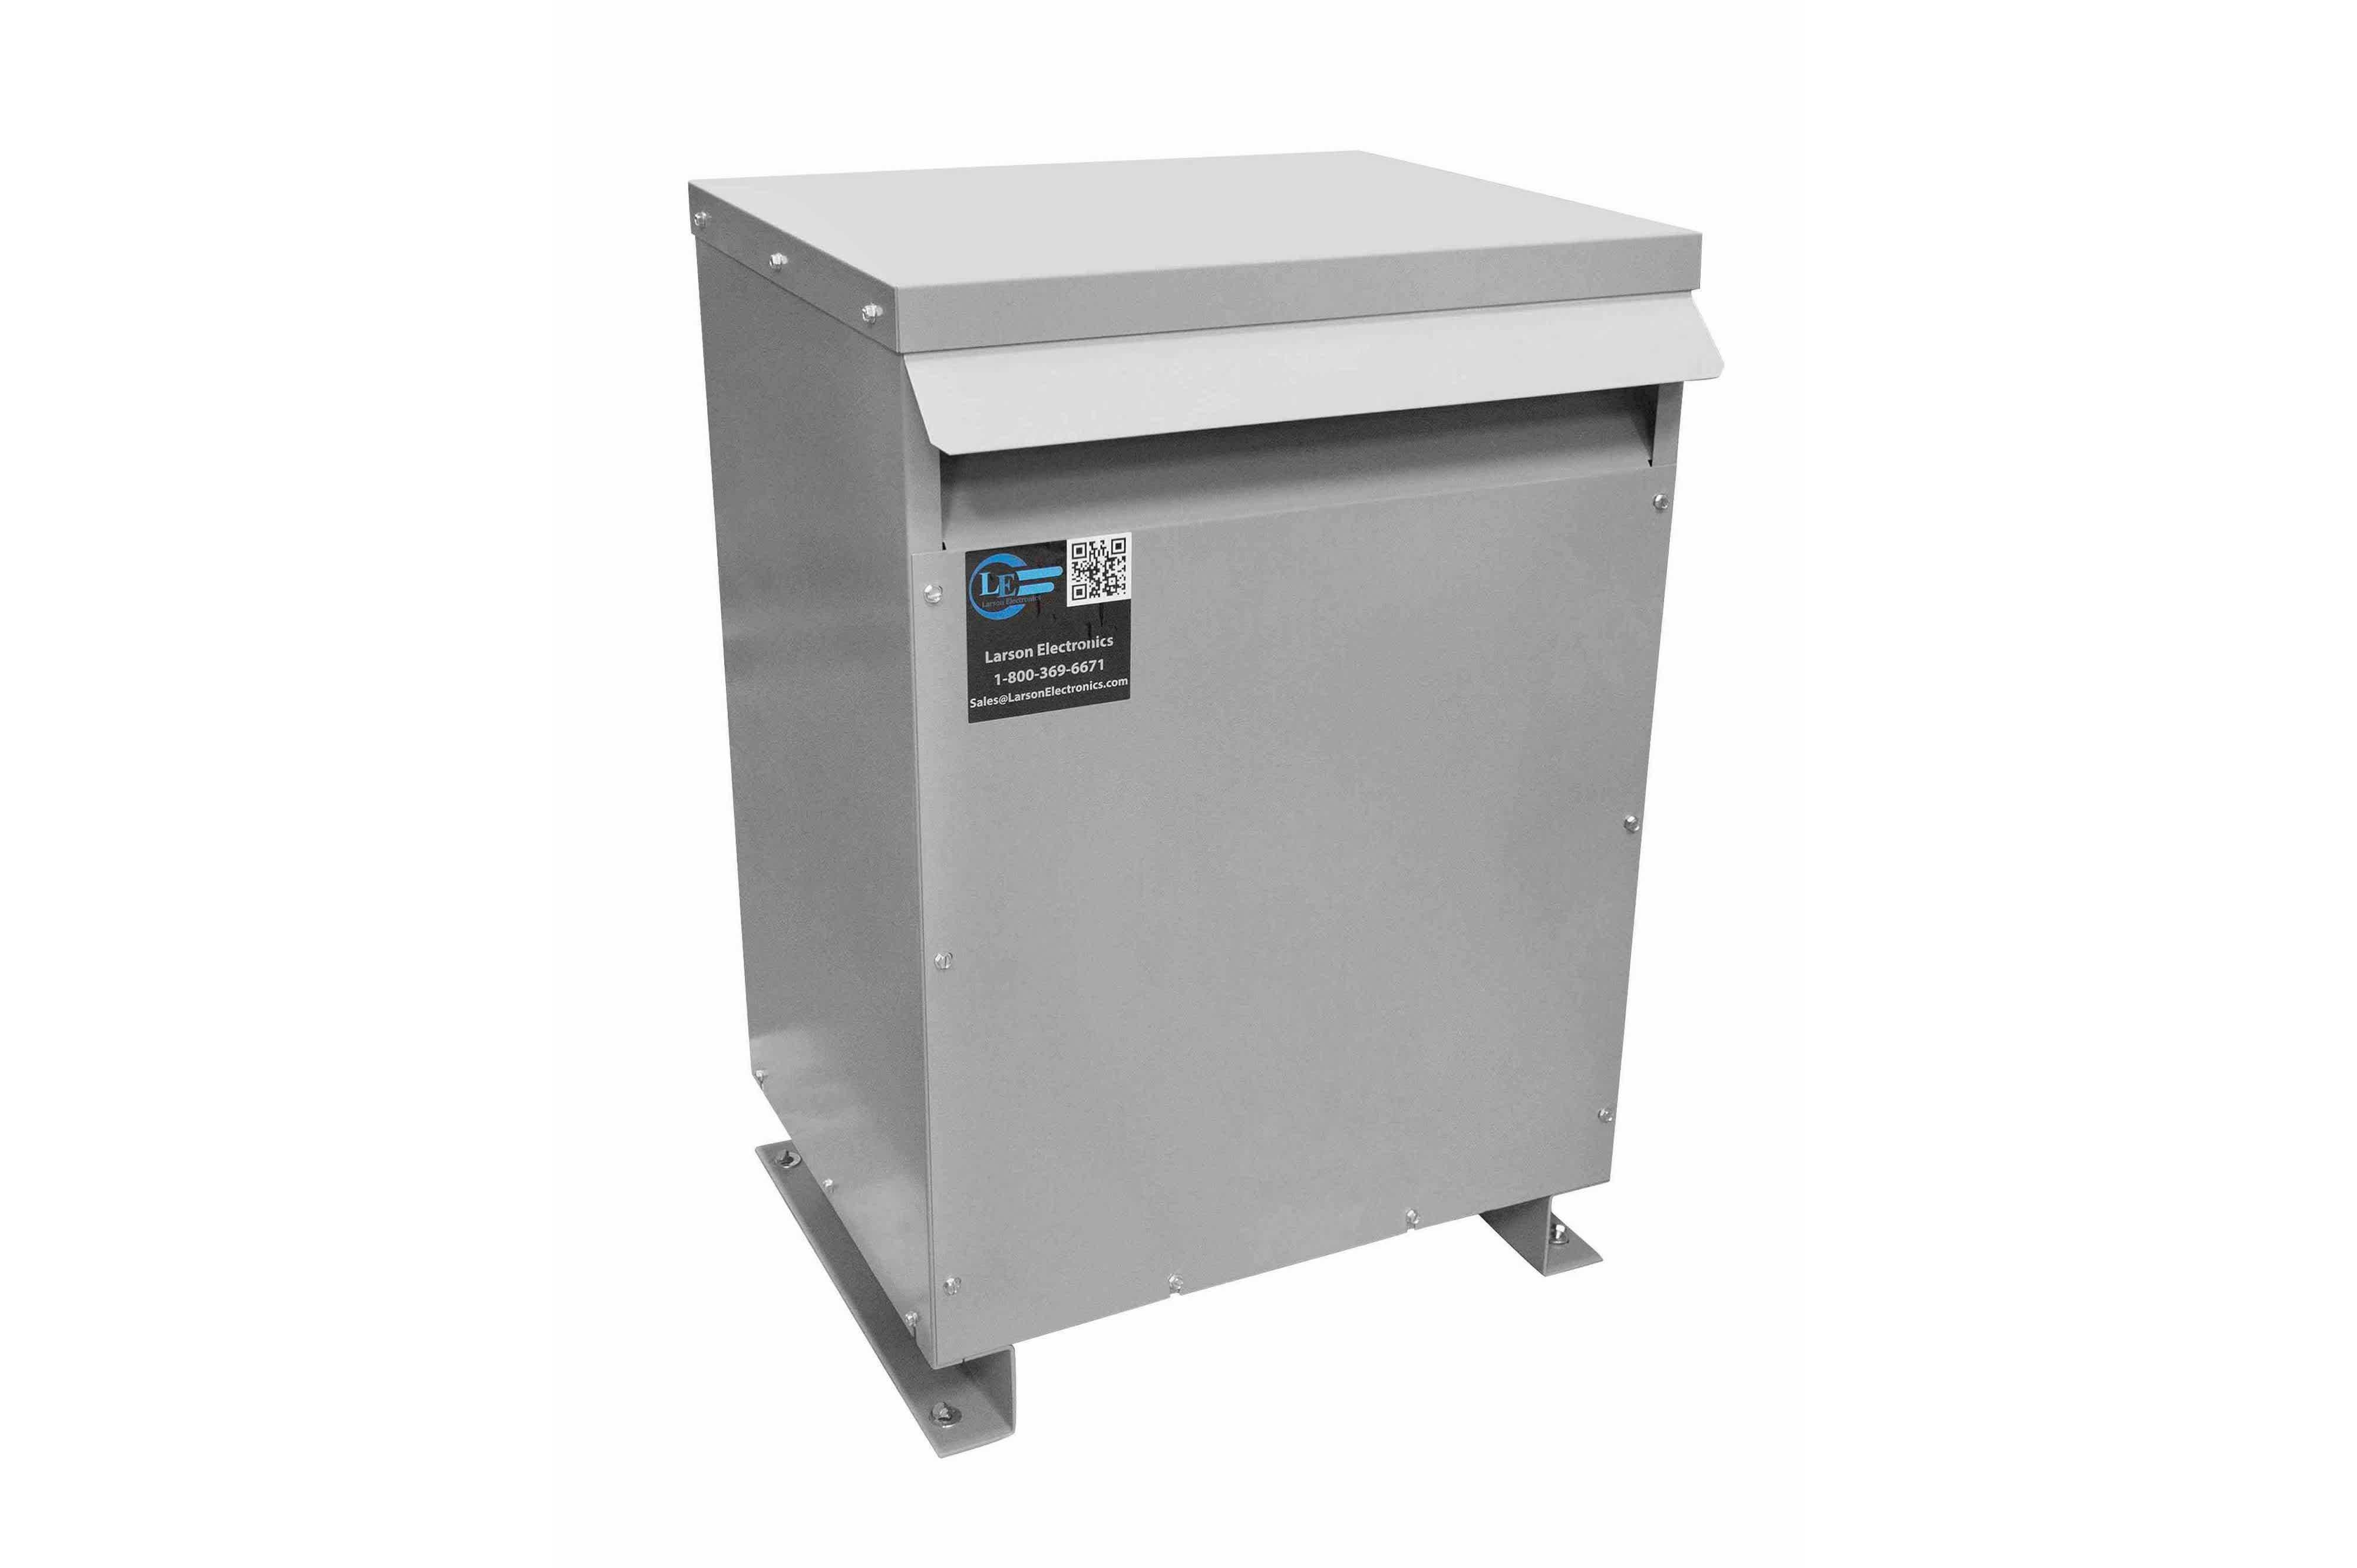 15 kVA 3PH Isolation Transformer, 208V Wye Primary, 600Y/347 Wye-N Secondary, N3R, Ventilated, 60 Hz